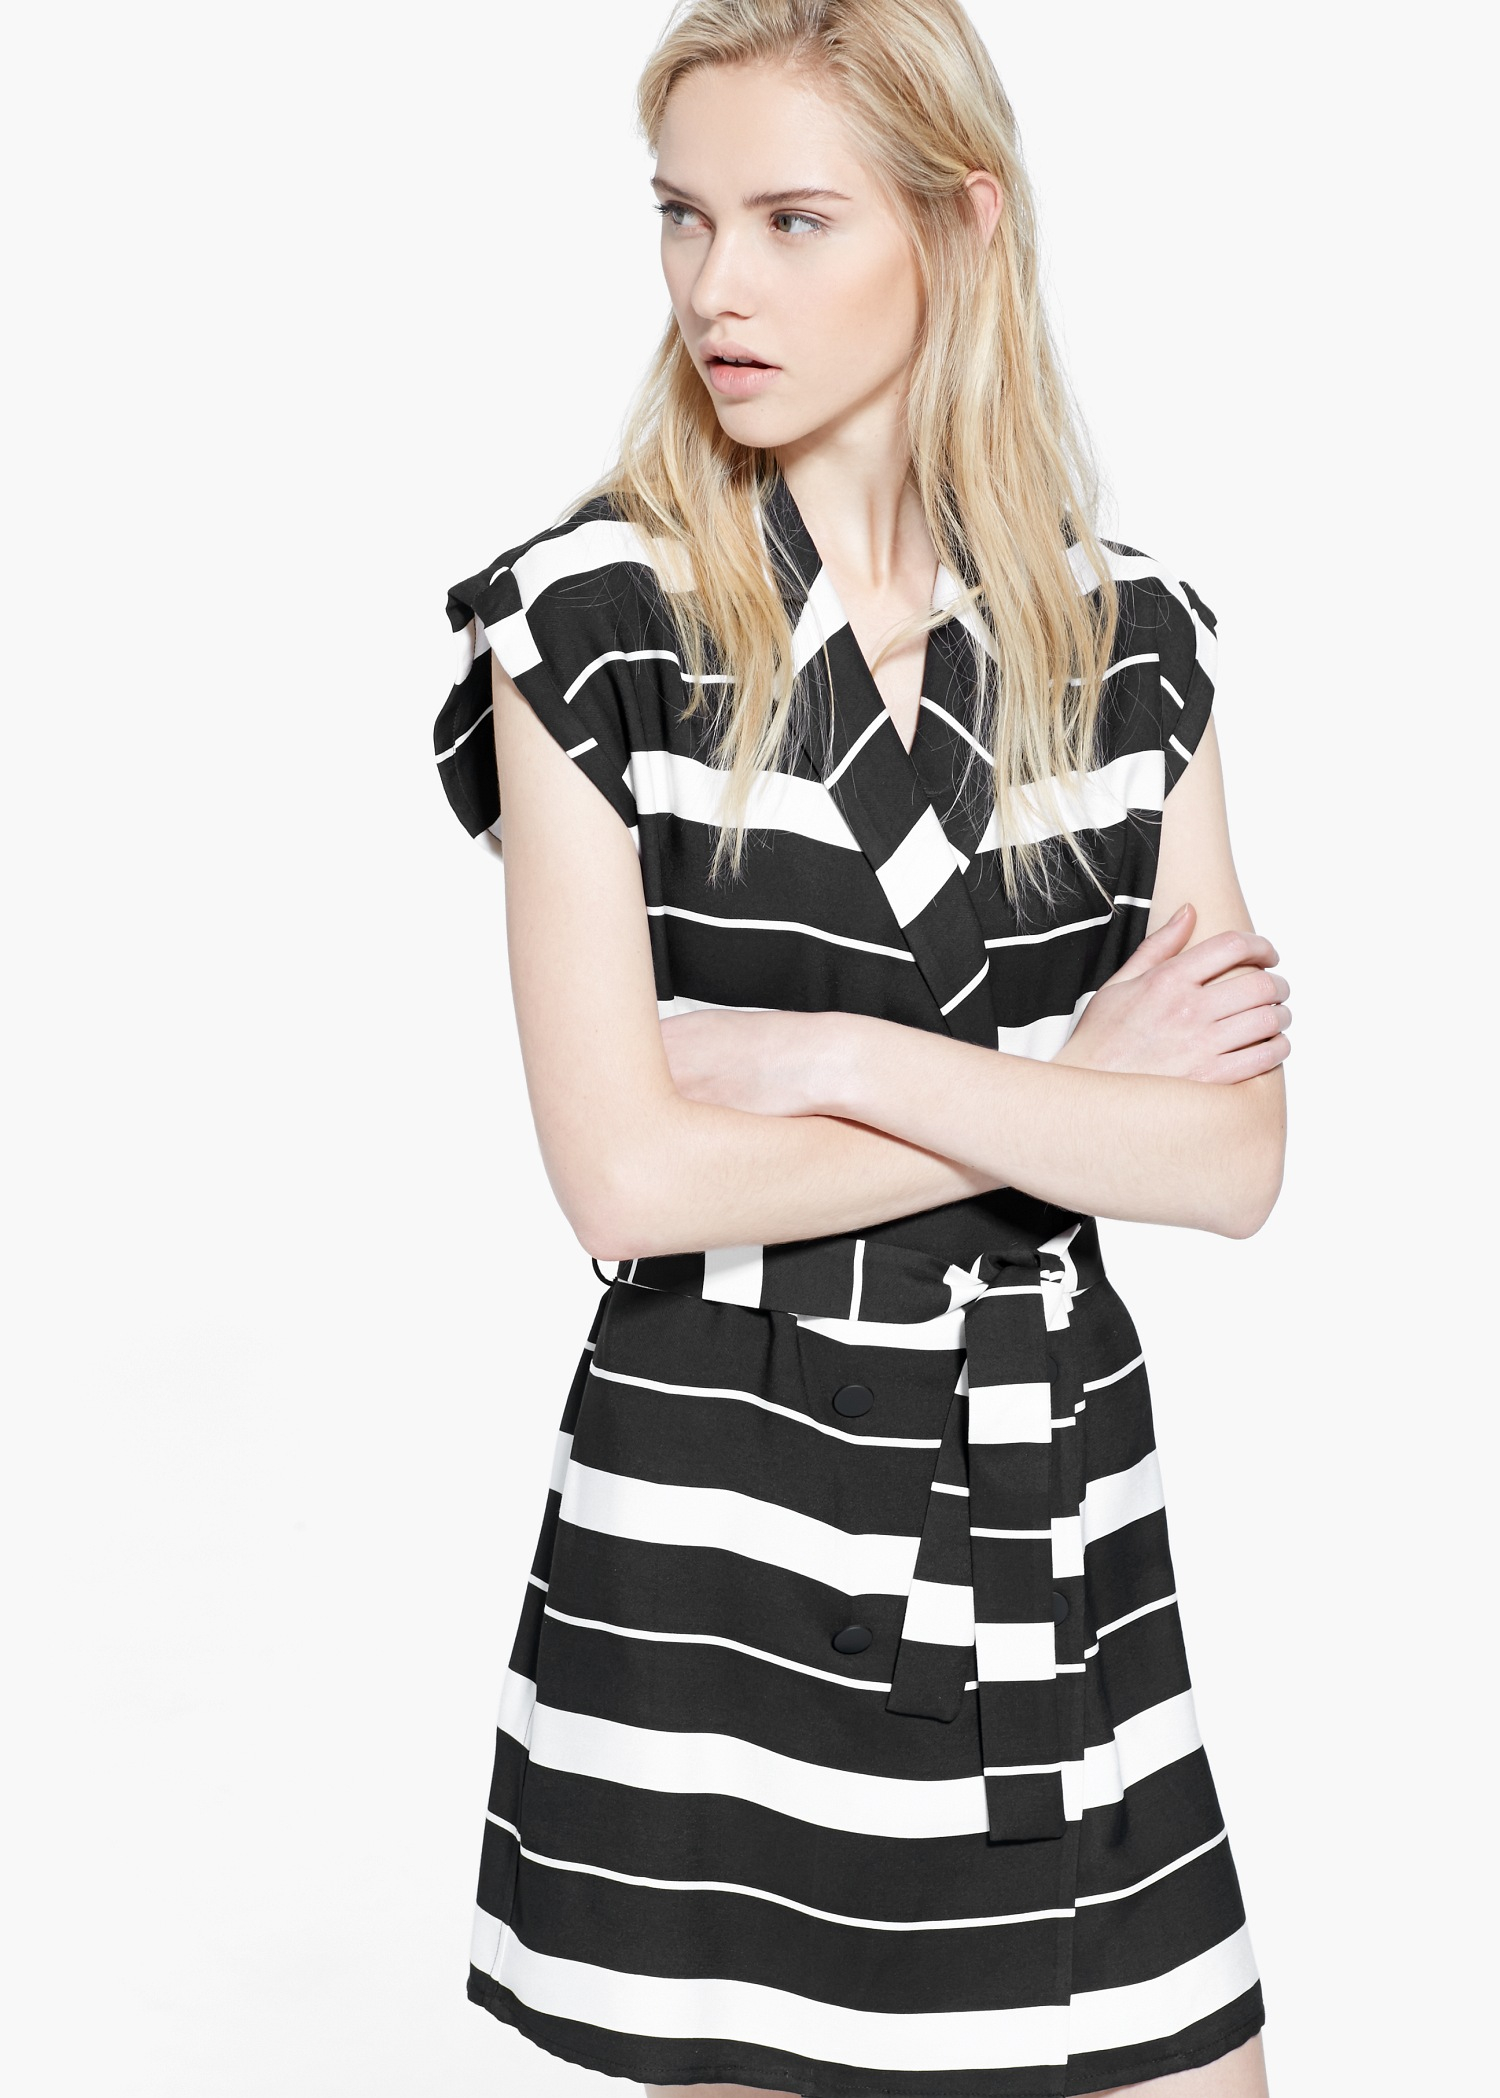 57c0baac86 Lyst - Mango Double-Breasted Dress in Black